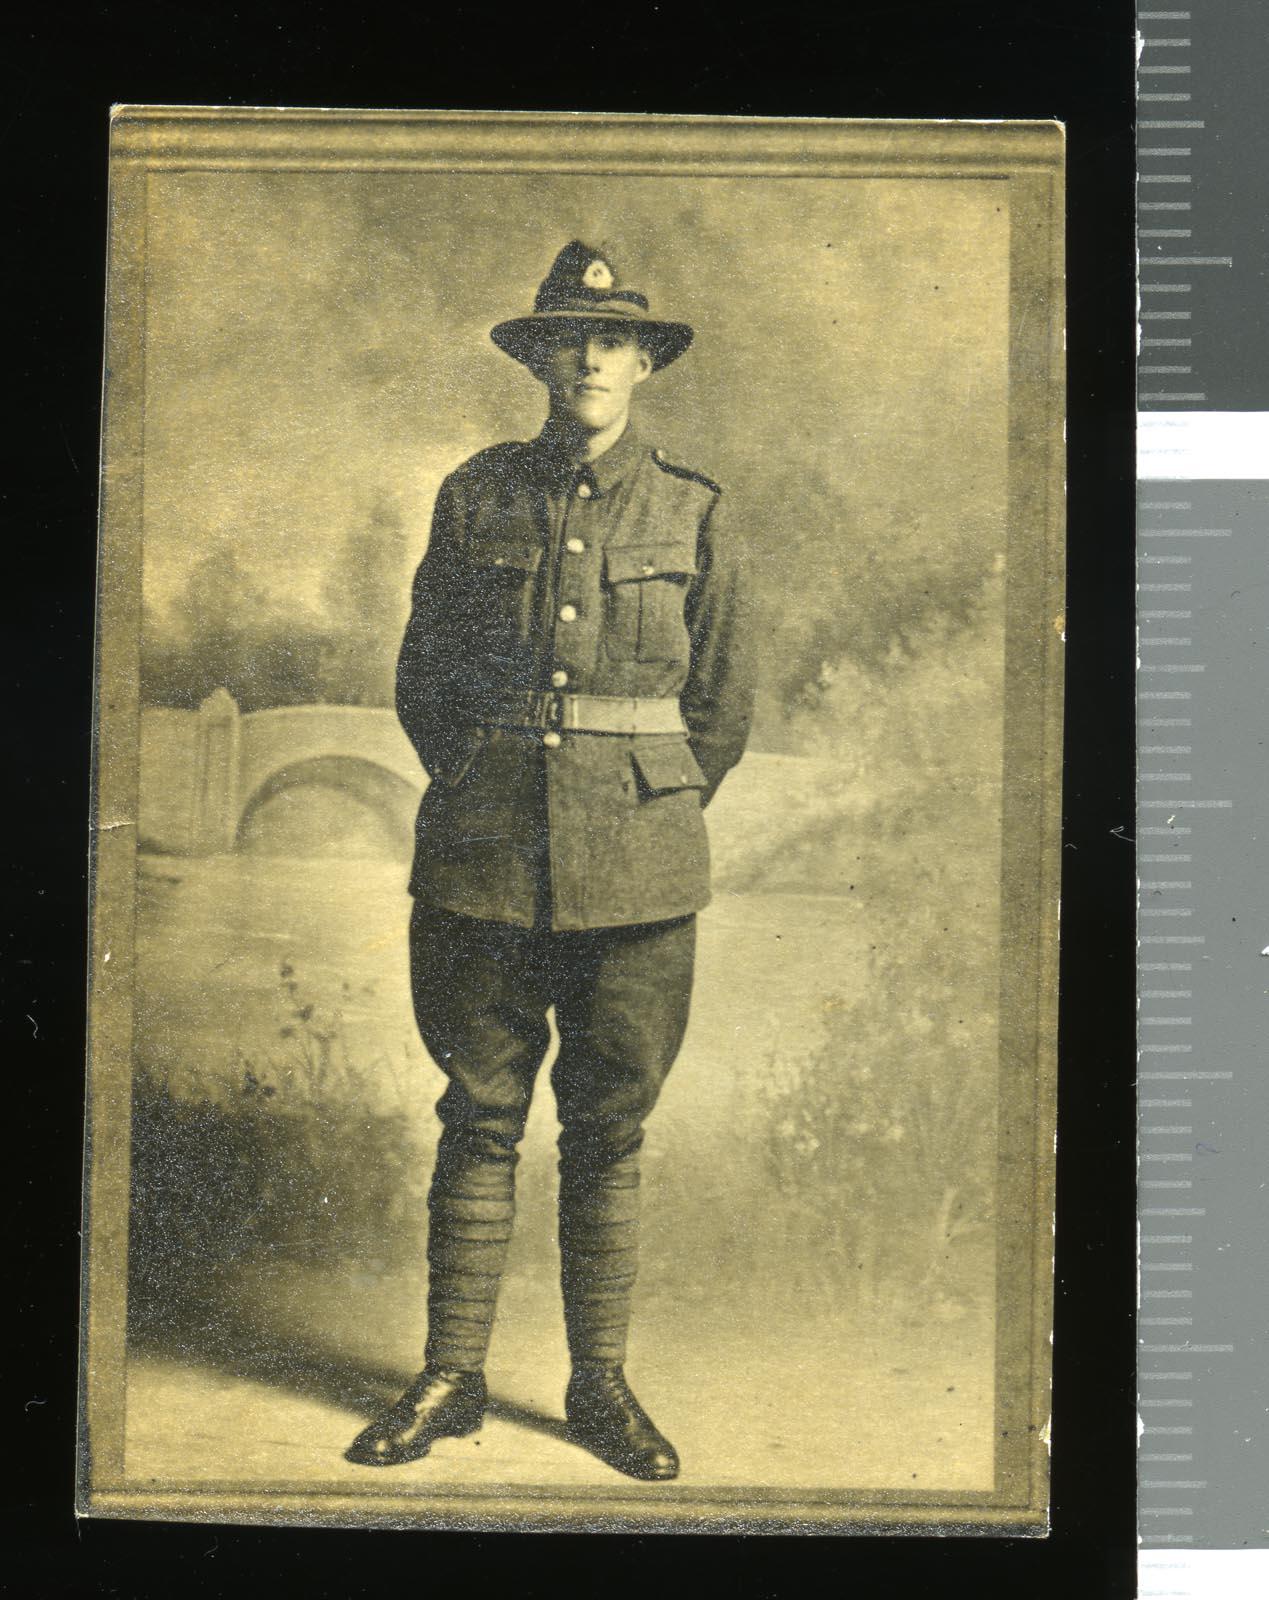 Frank Prestidge (service no. 34727), circa 1916